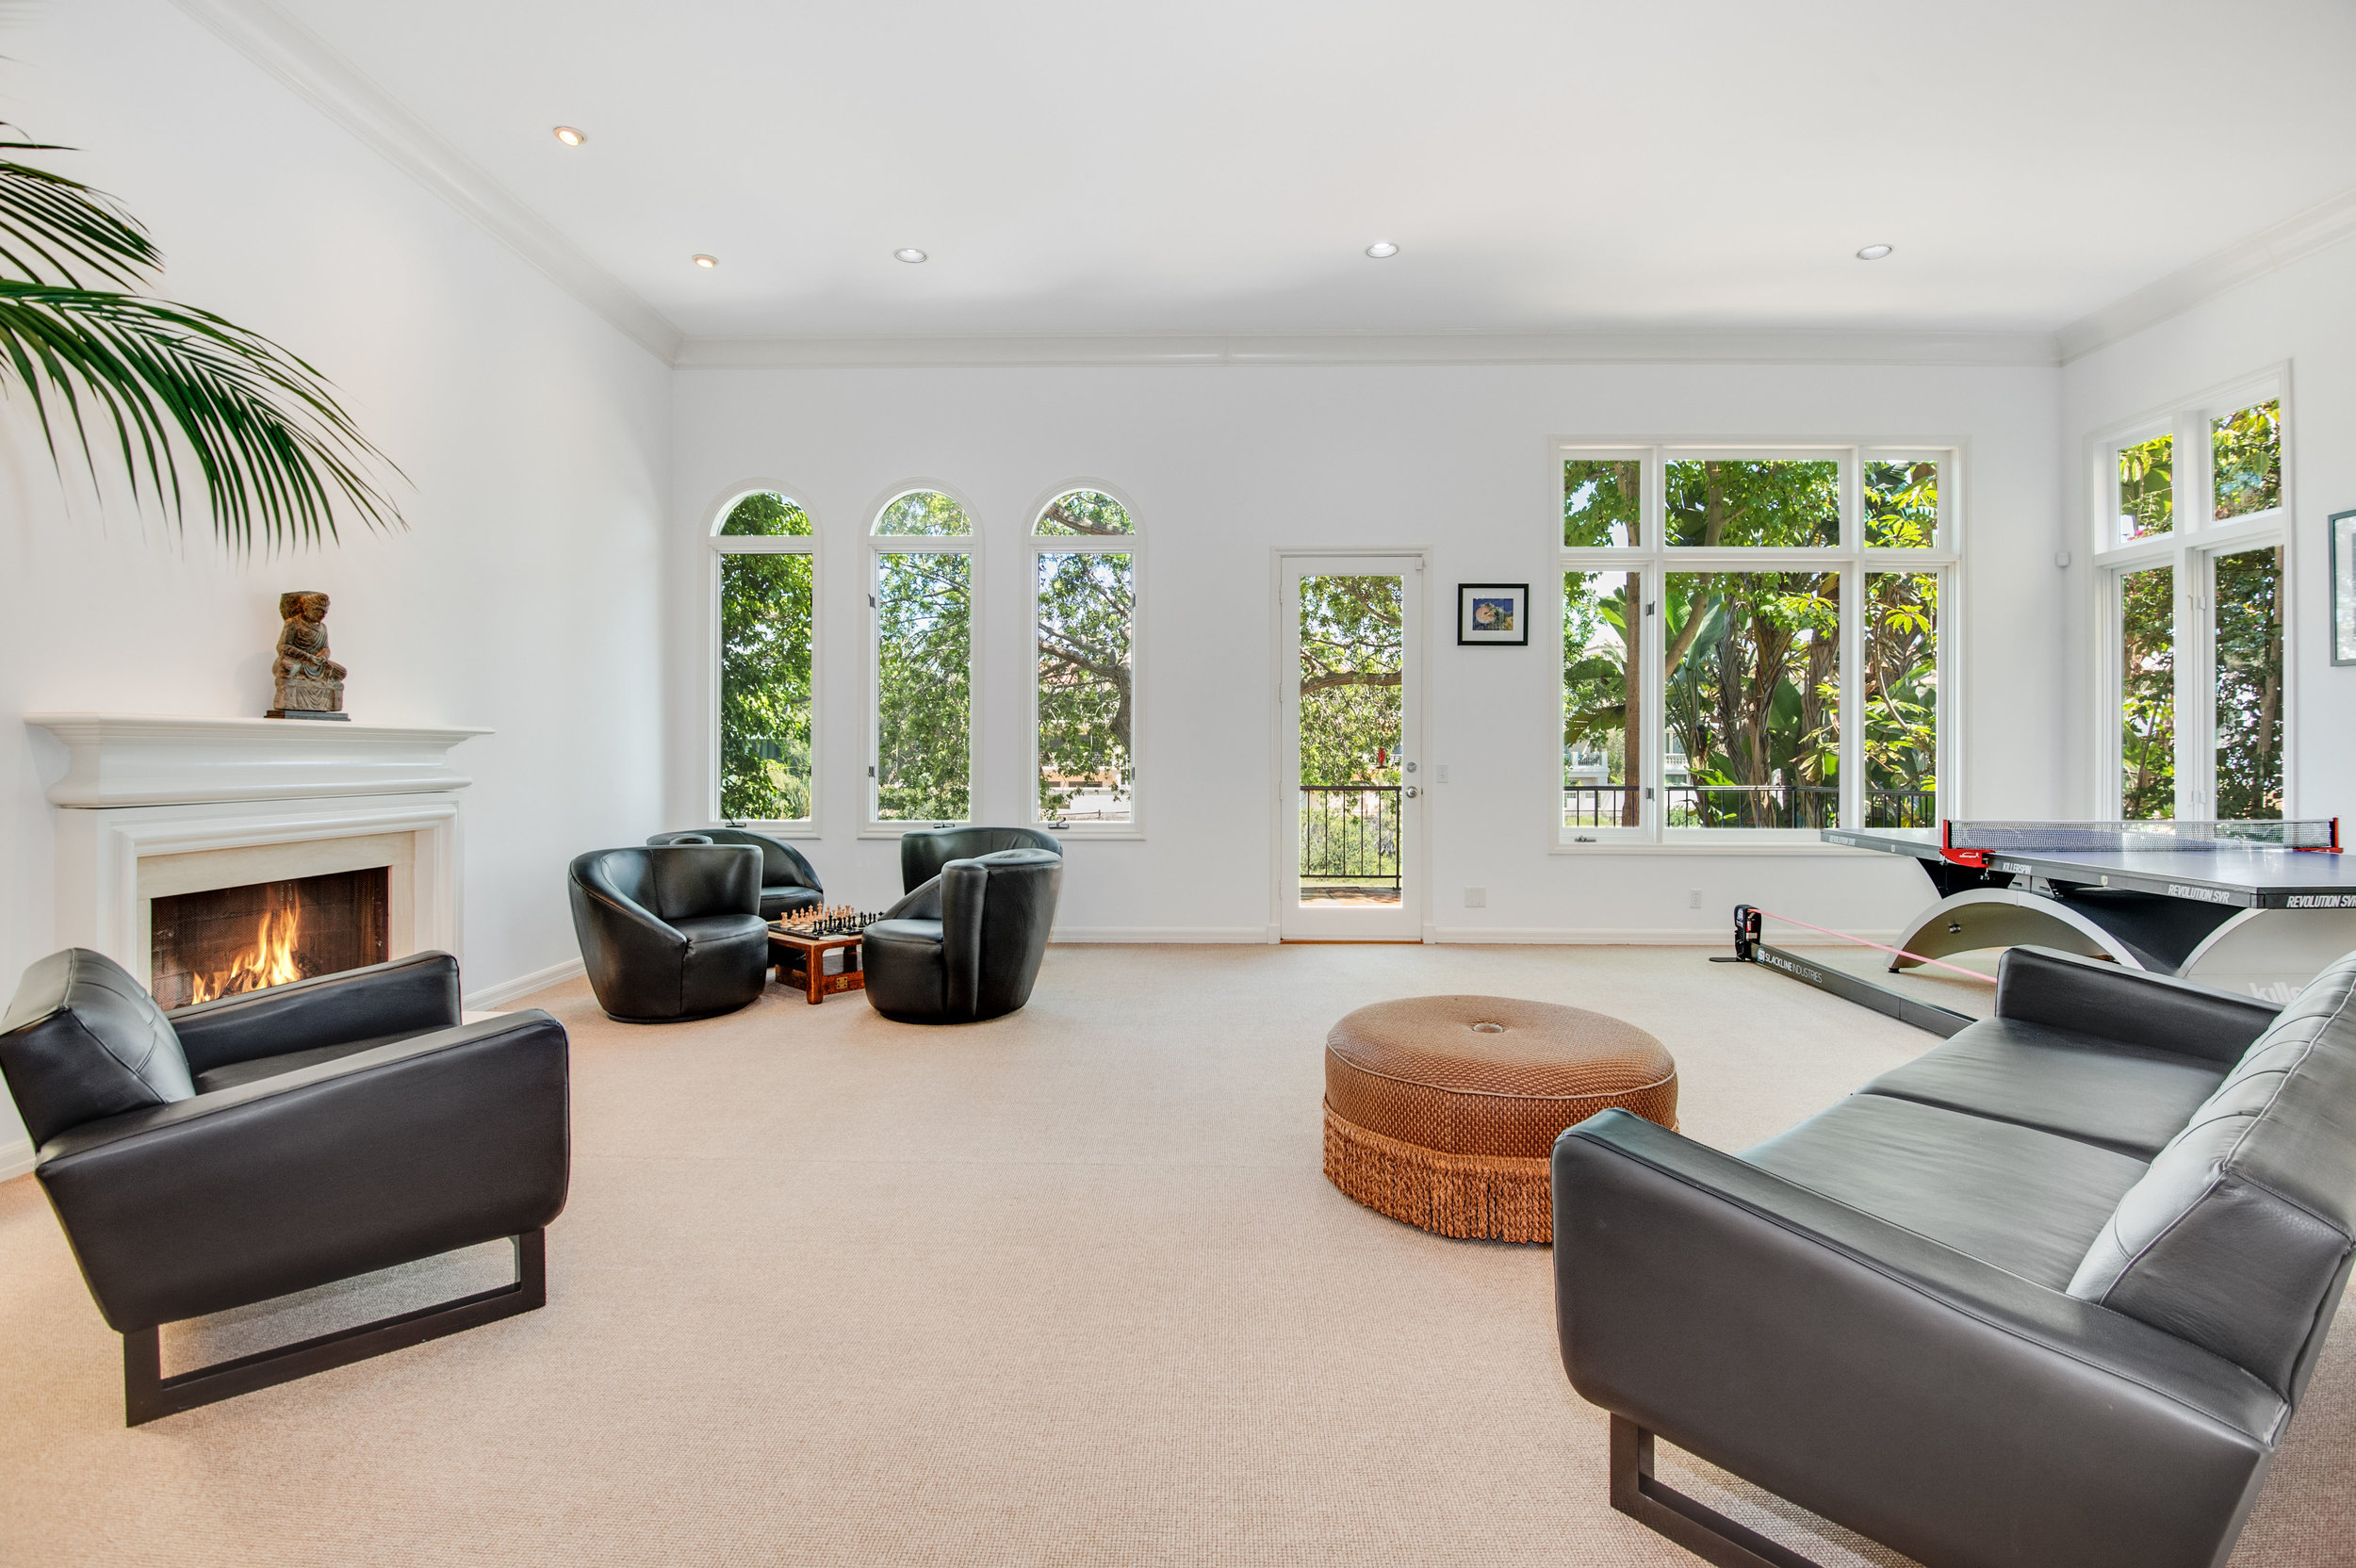 008 Living Room Malibu For Sale Lease The Malibu Life Team Luxury Real Estate.jpg